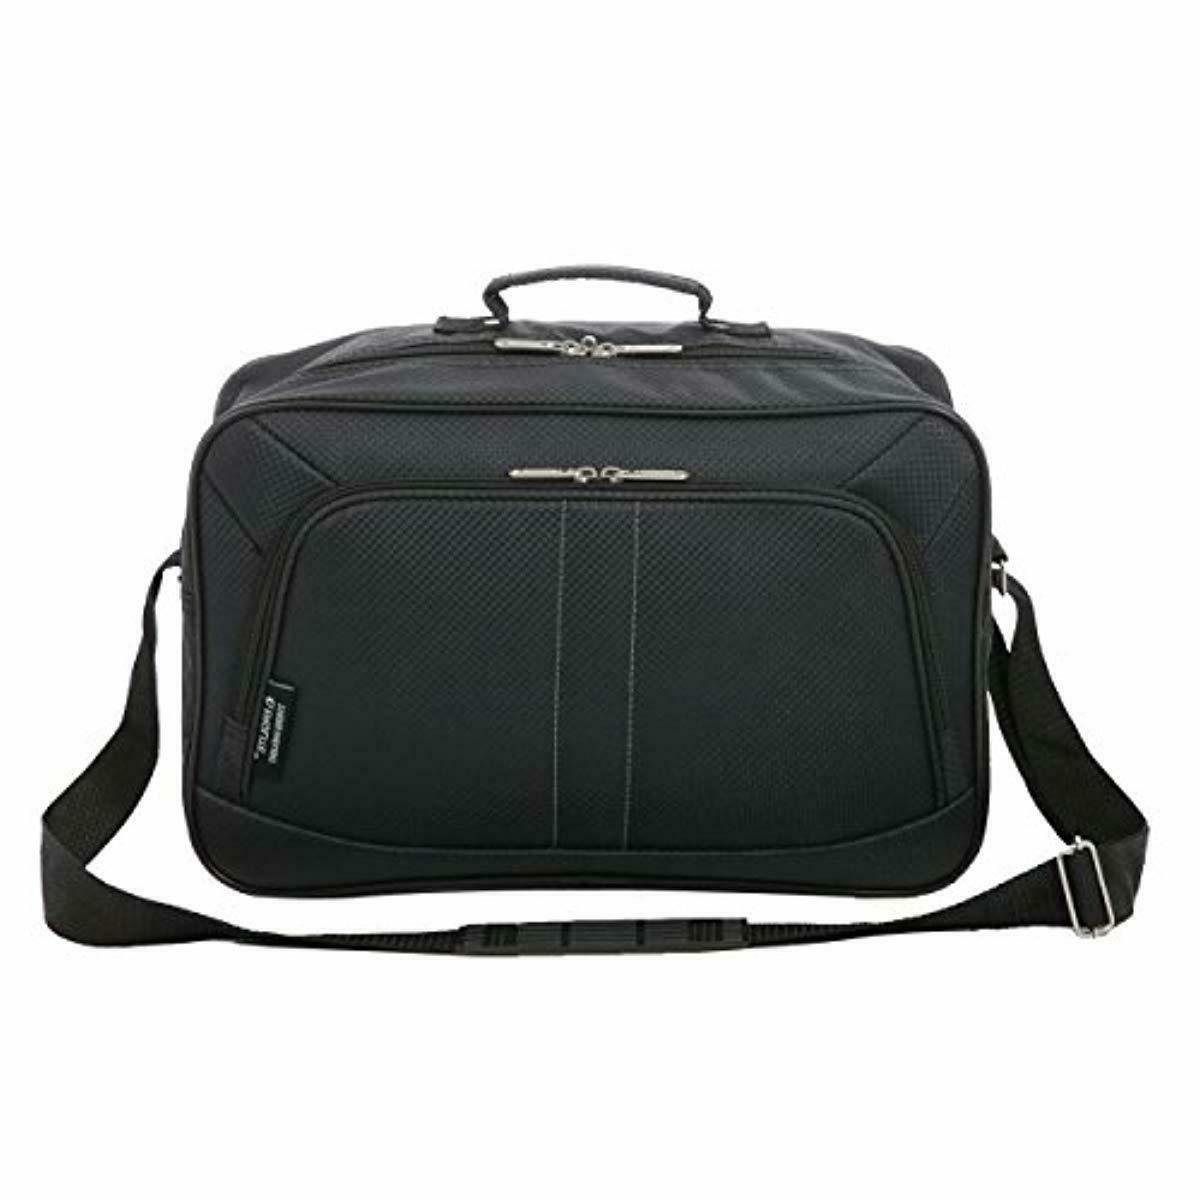 16 On Hand Flight Duffle Bag, Bag or